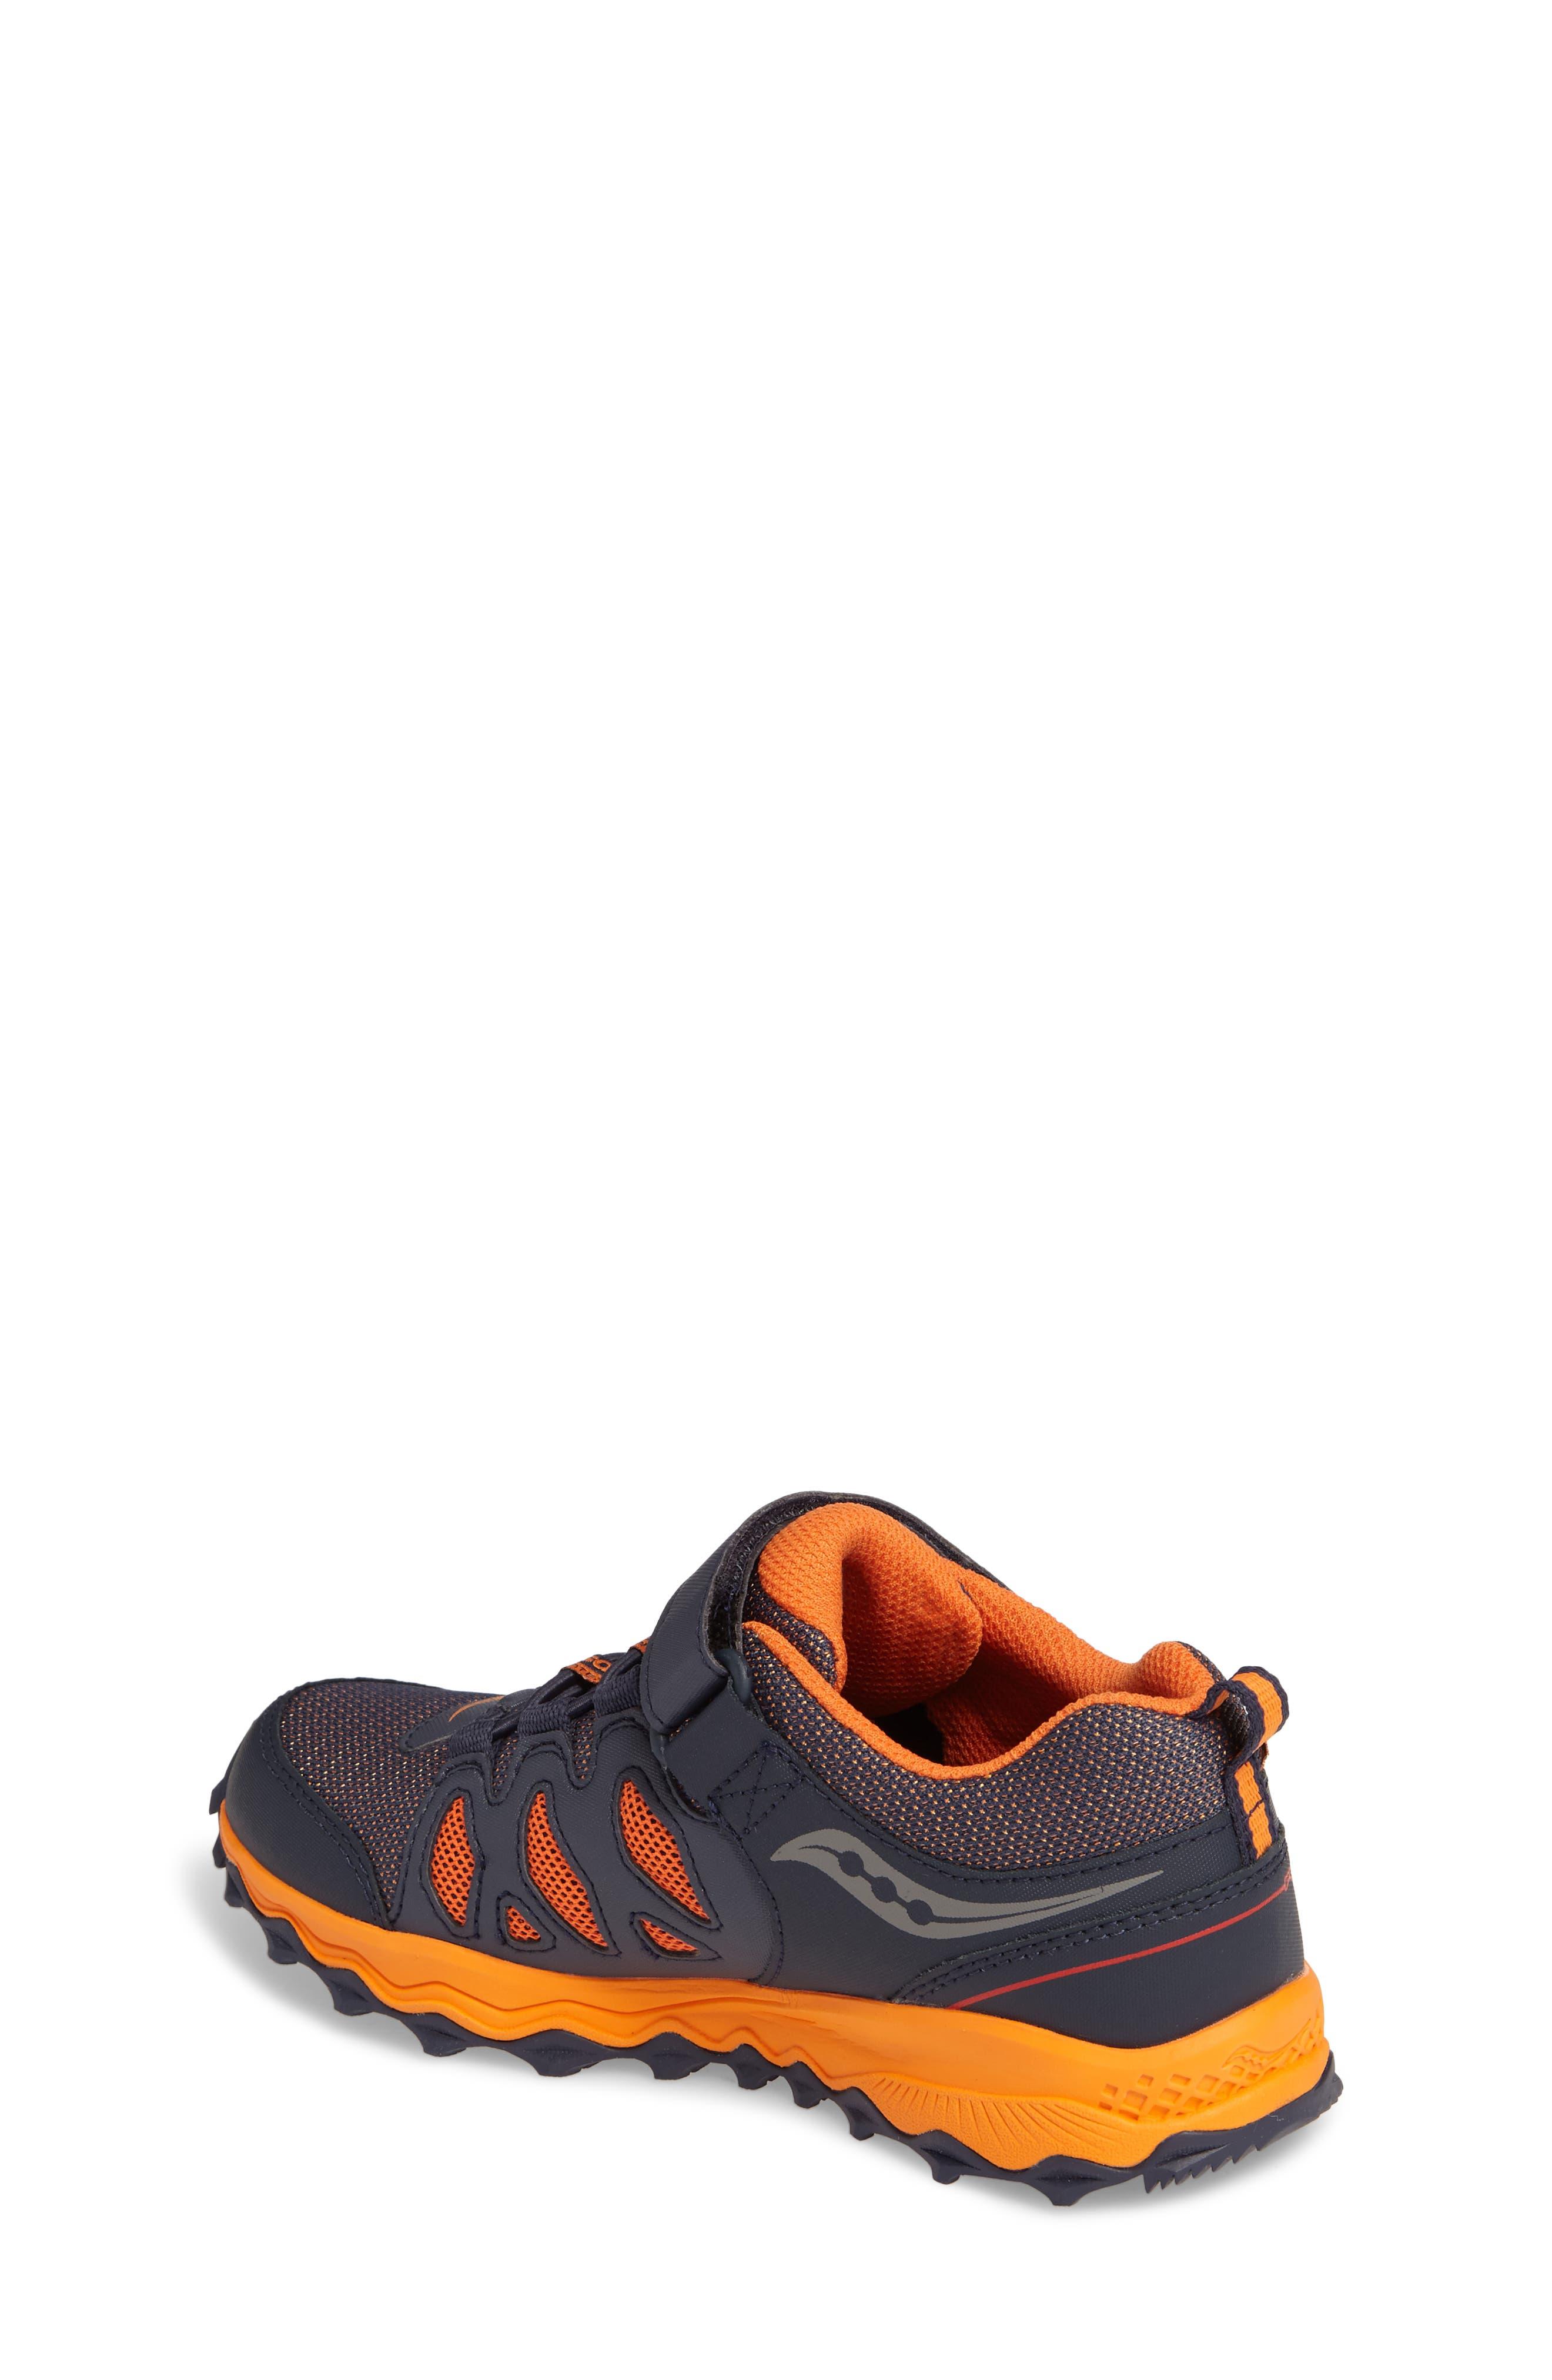 Peregrine Shield Water-Resistant Sneaker,                             Alternate thumbnail 4, color,